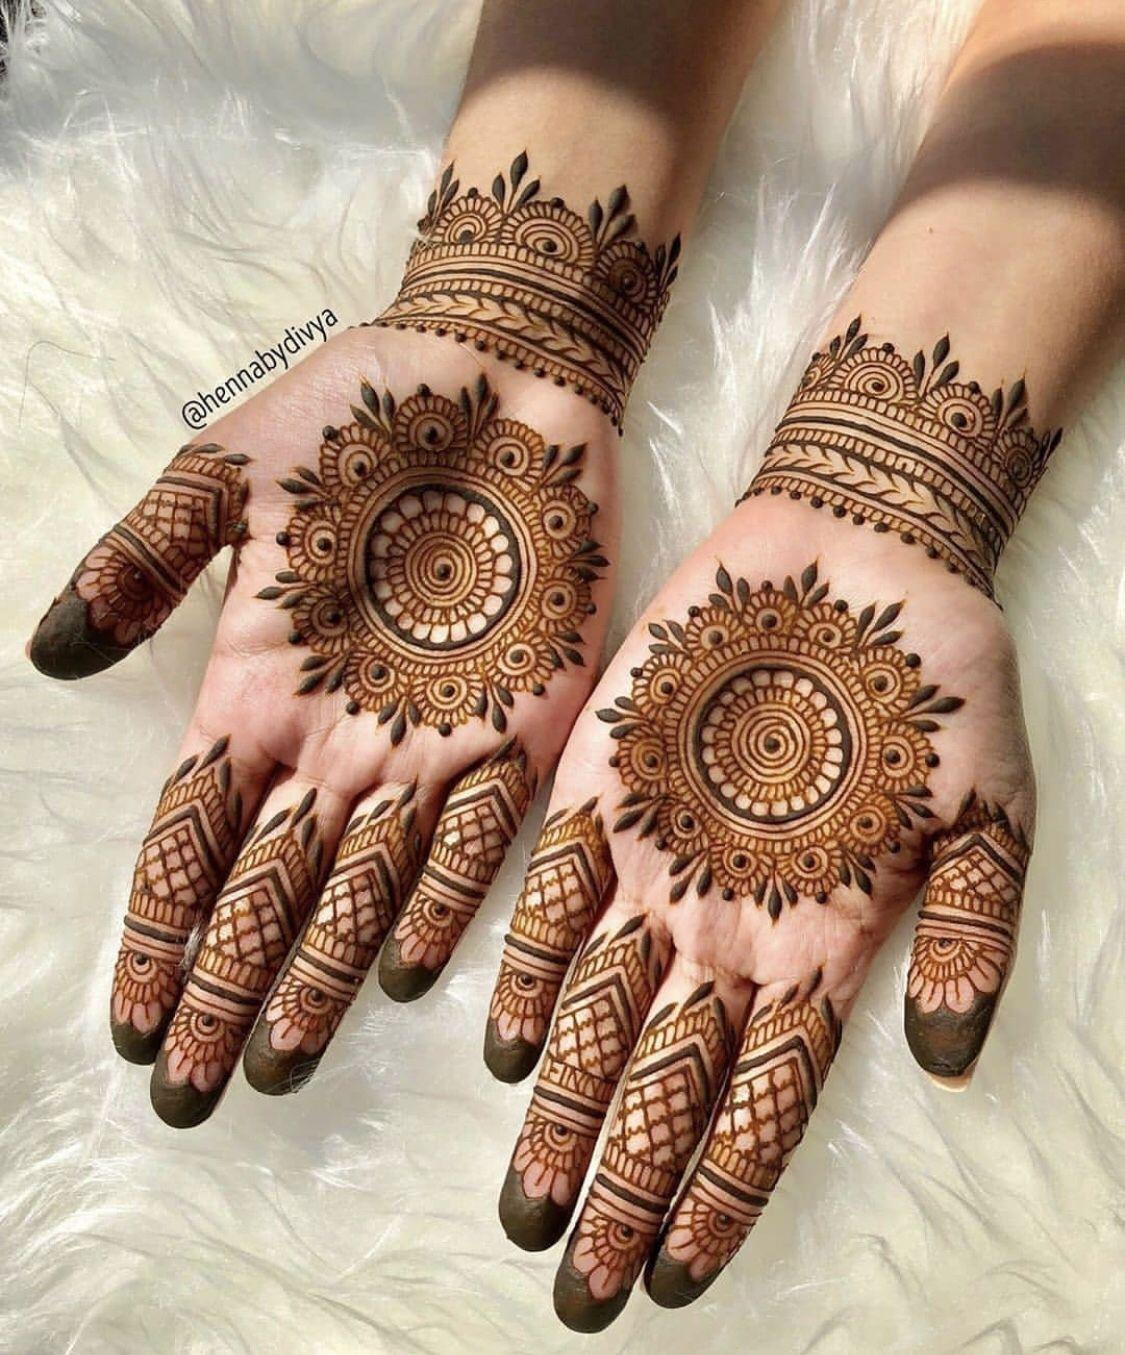 Mehndi Designs 2019 Henna Art Mehndi Designs Mehndi Henna Designs